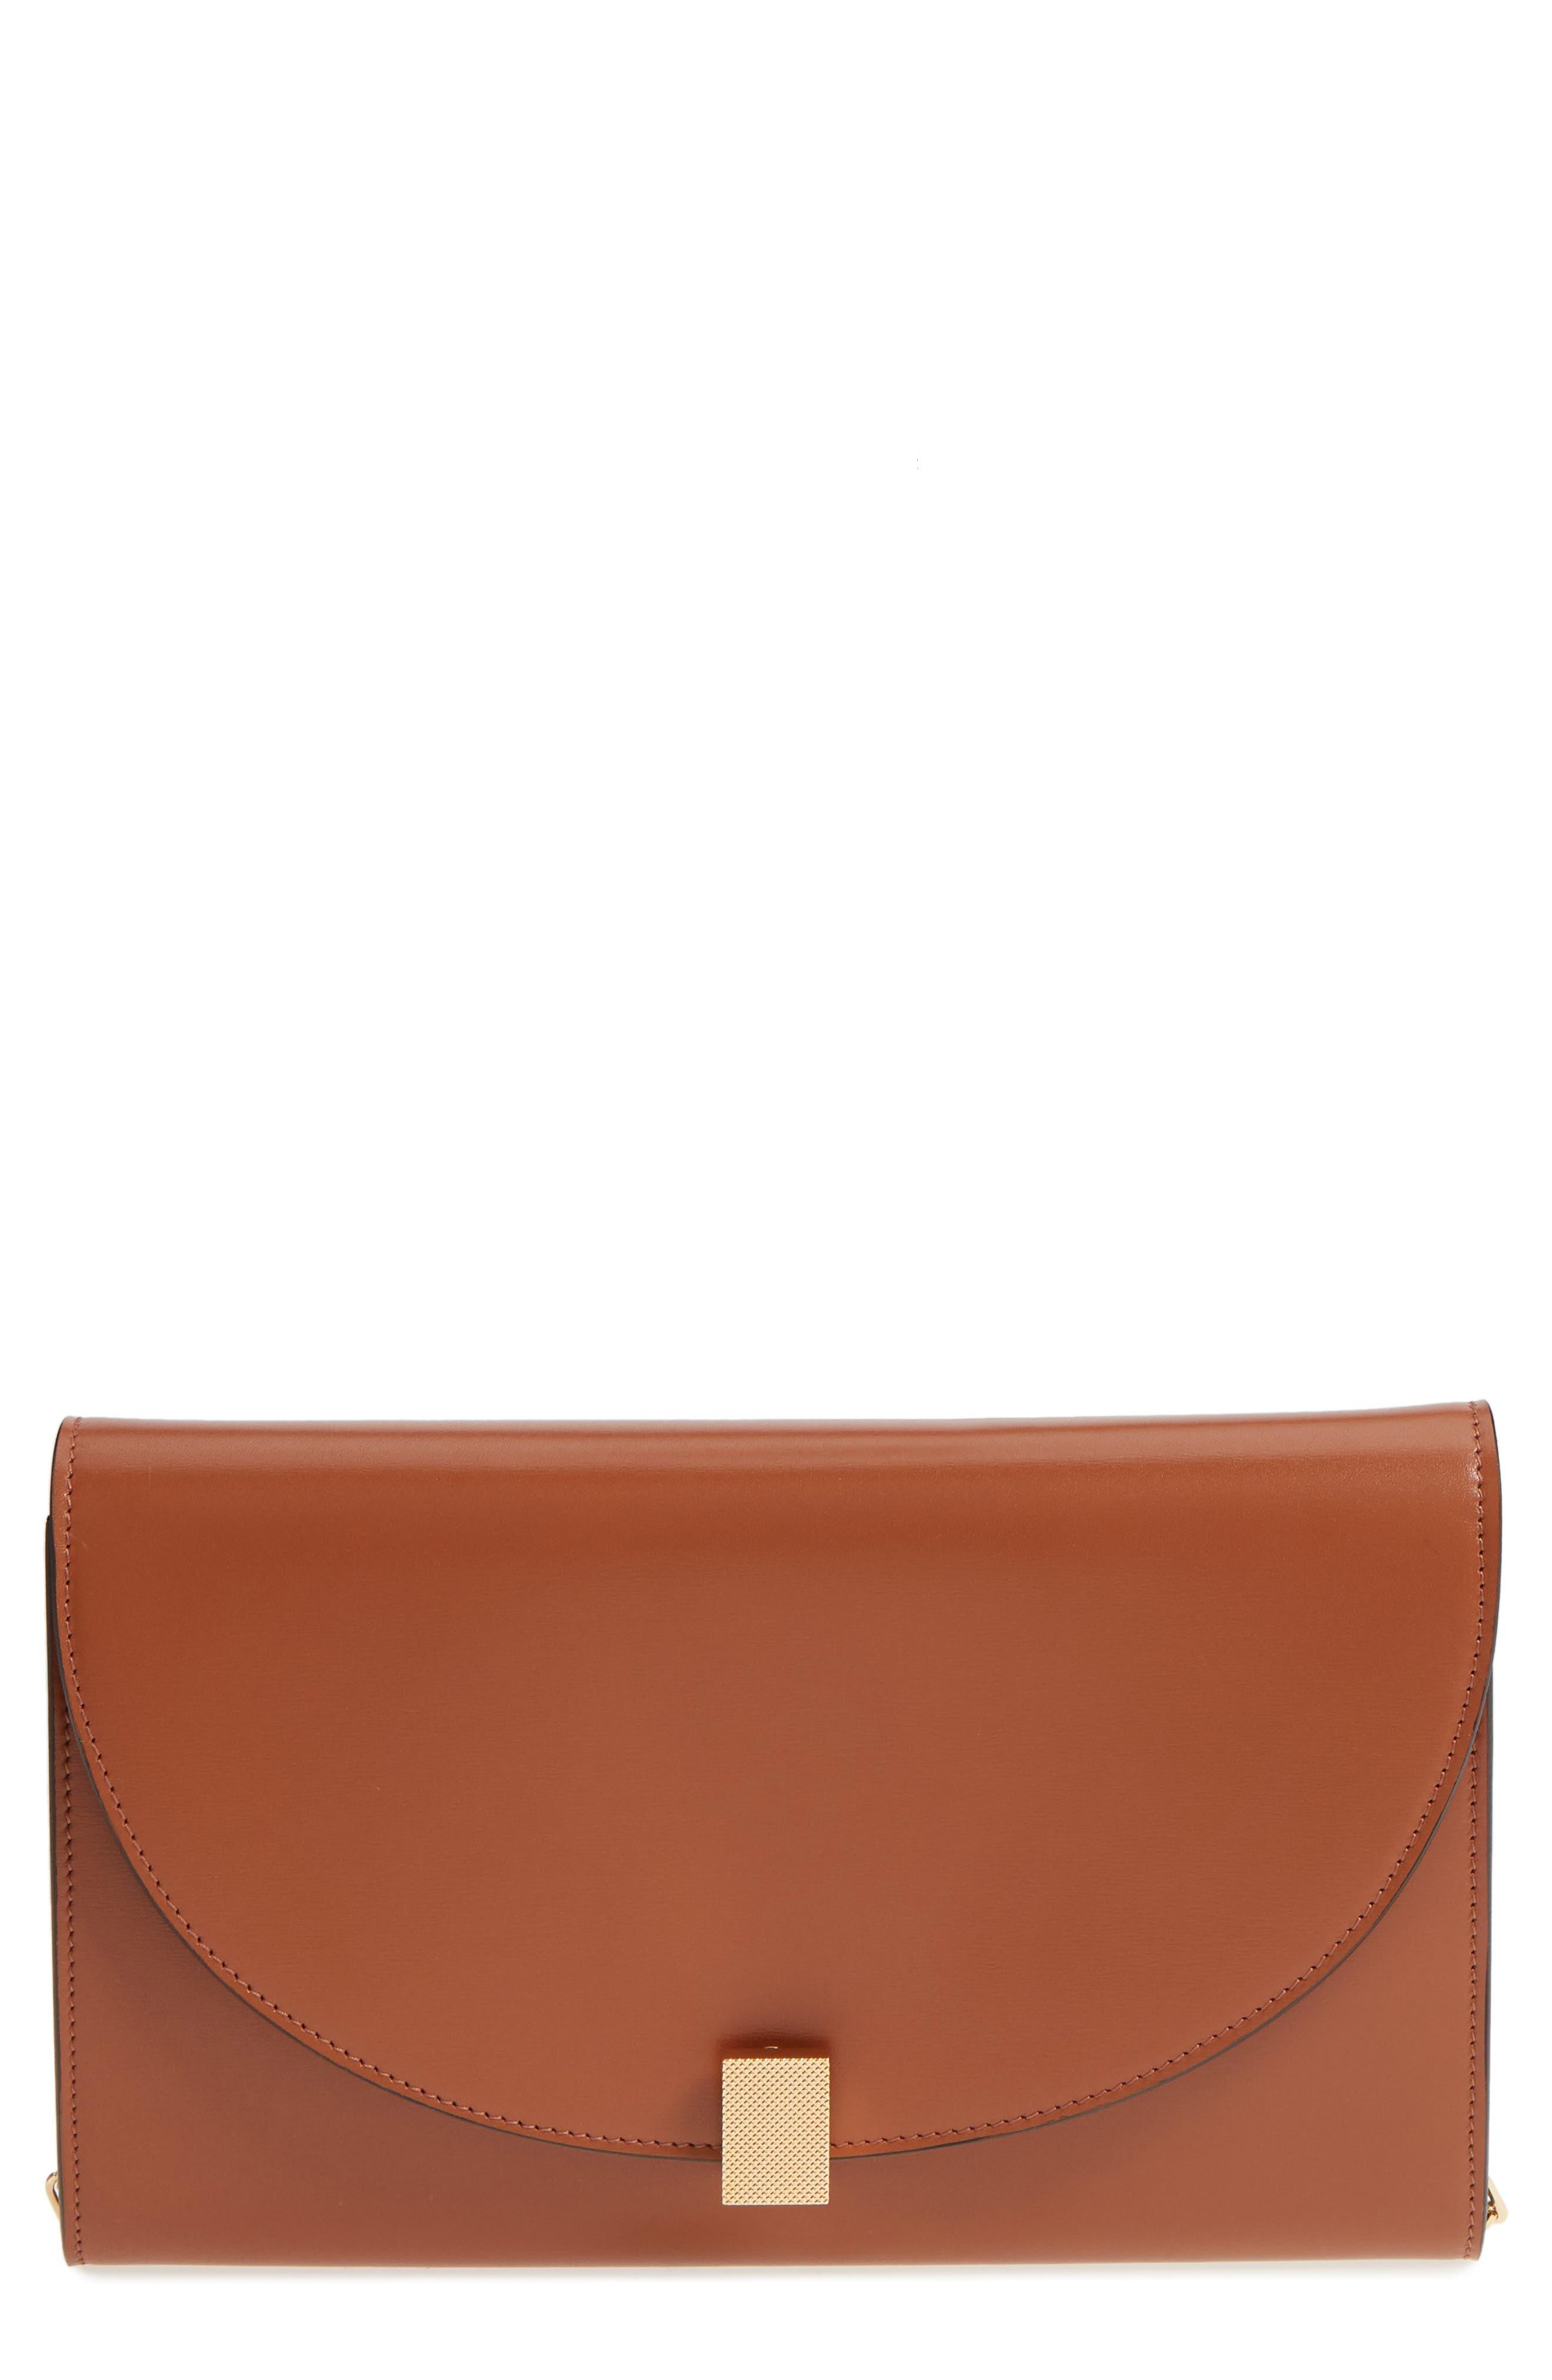 Victoria Beckham Half Moon Calfskin Leather Clutch